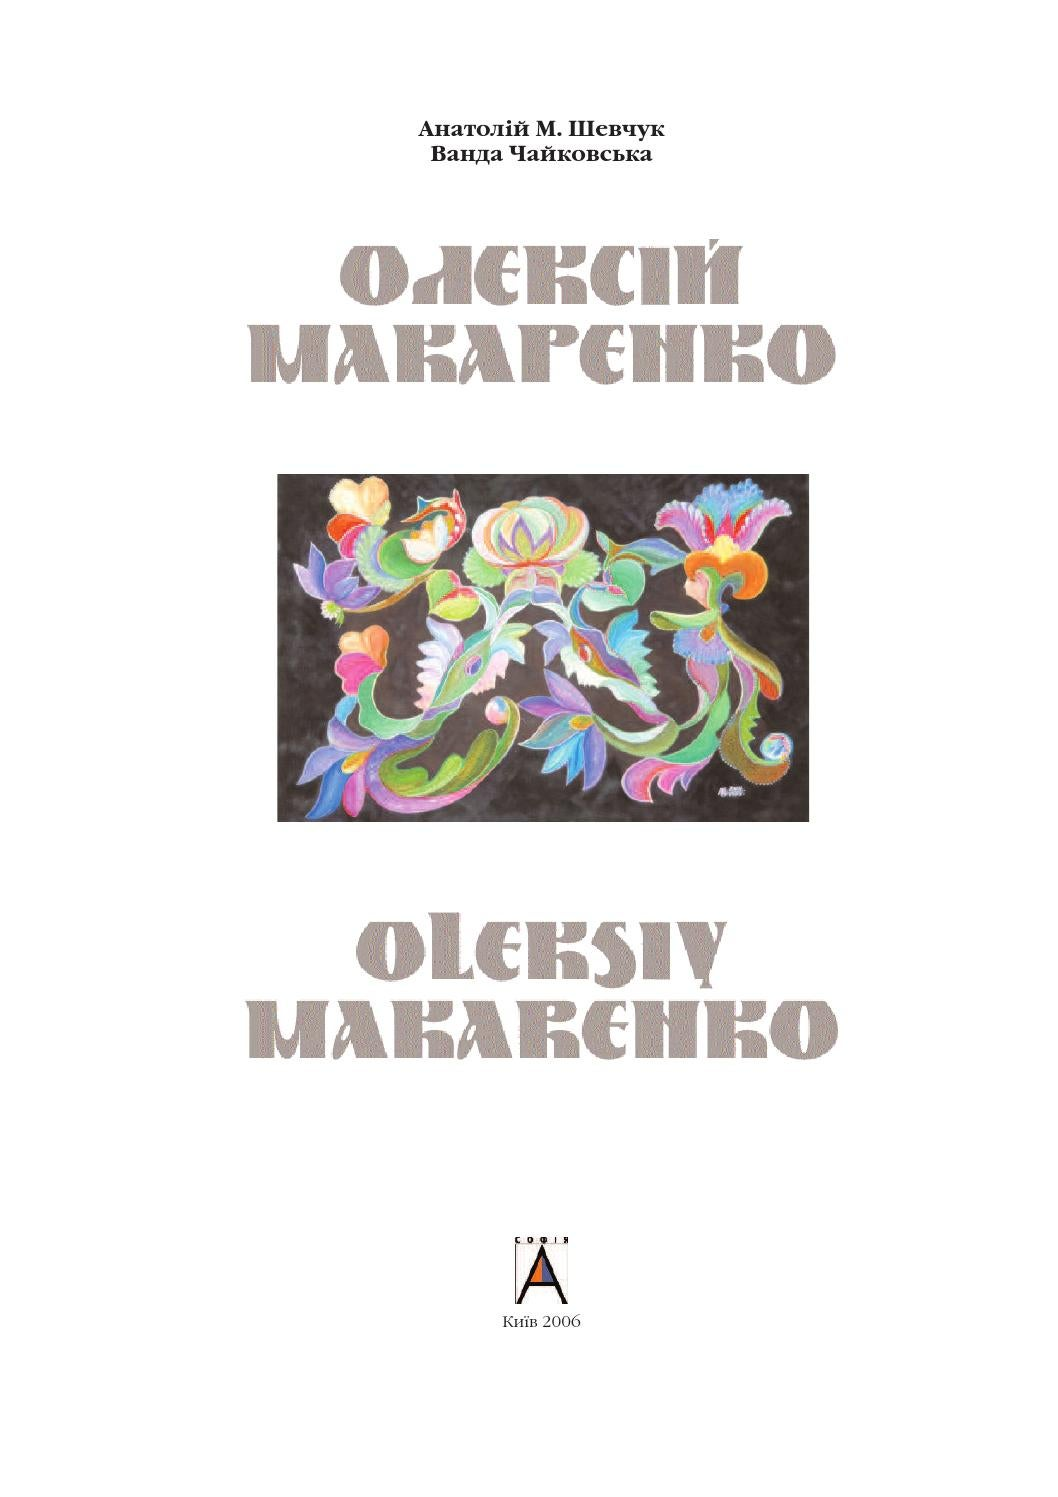 Oleksiy makarenko by IZPRC - issuu 5ca340b959976